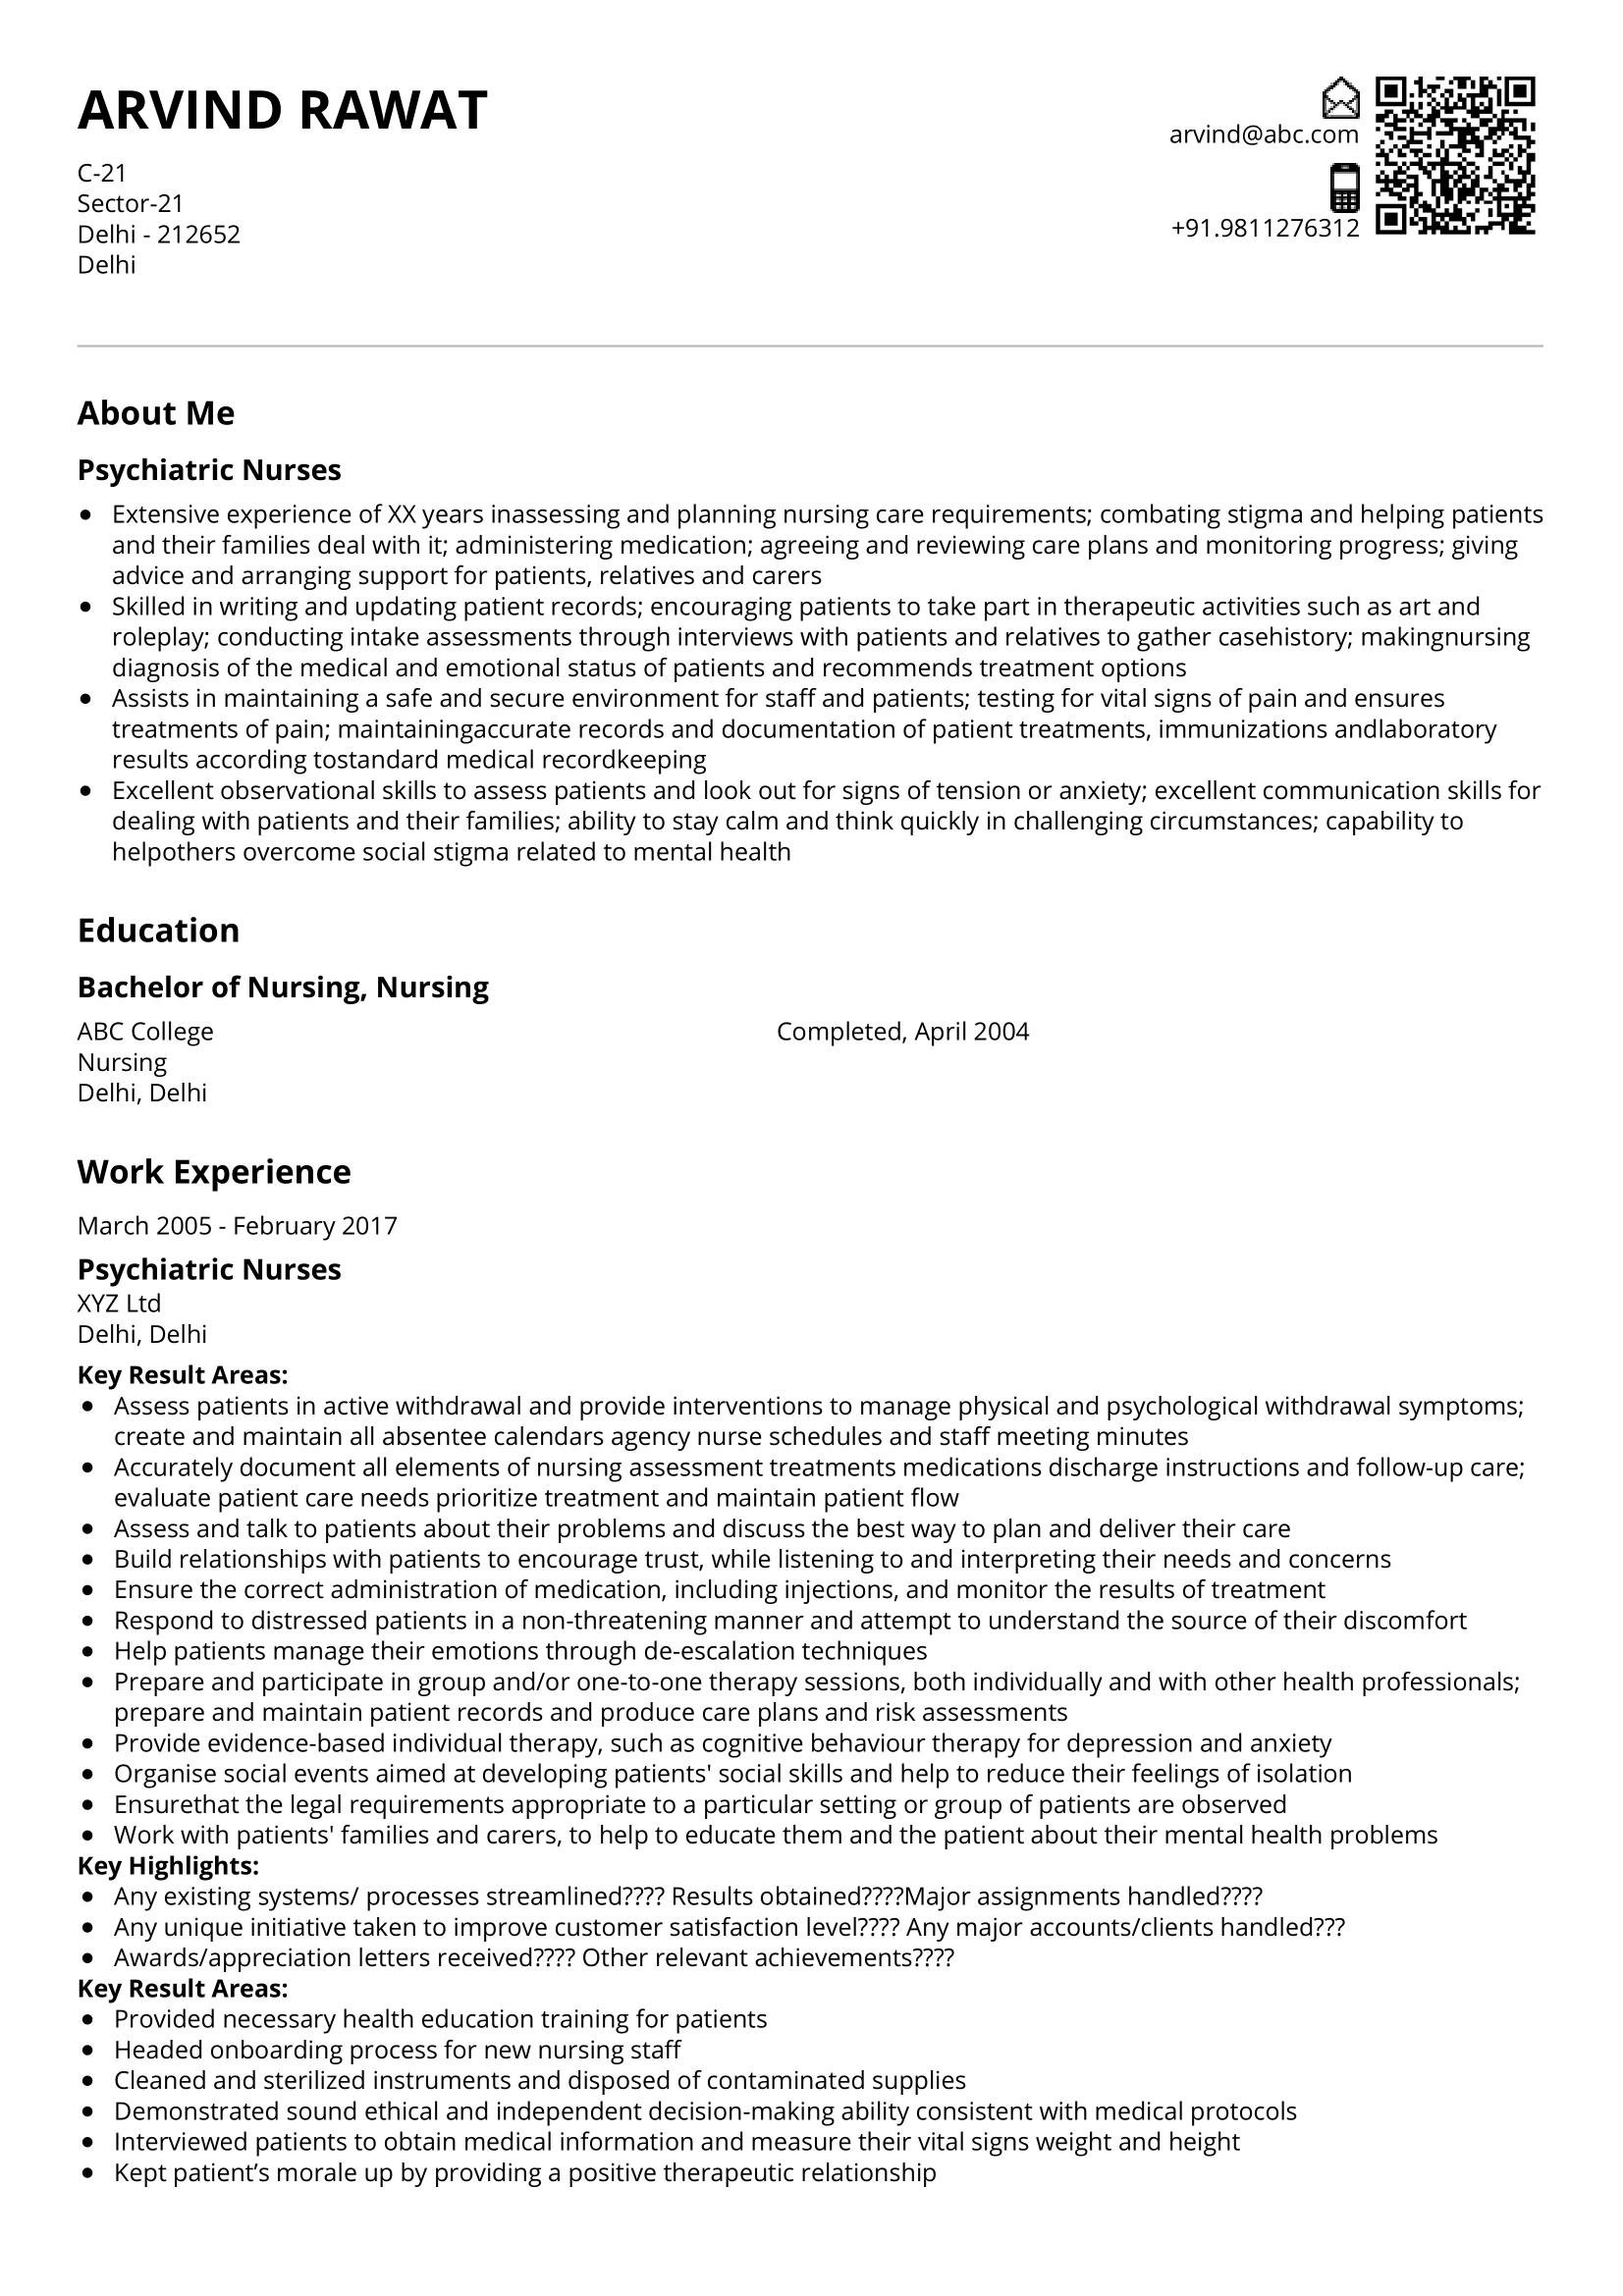 cv template for auxiliary nurse  u2022 invitation template ideas